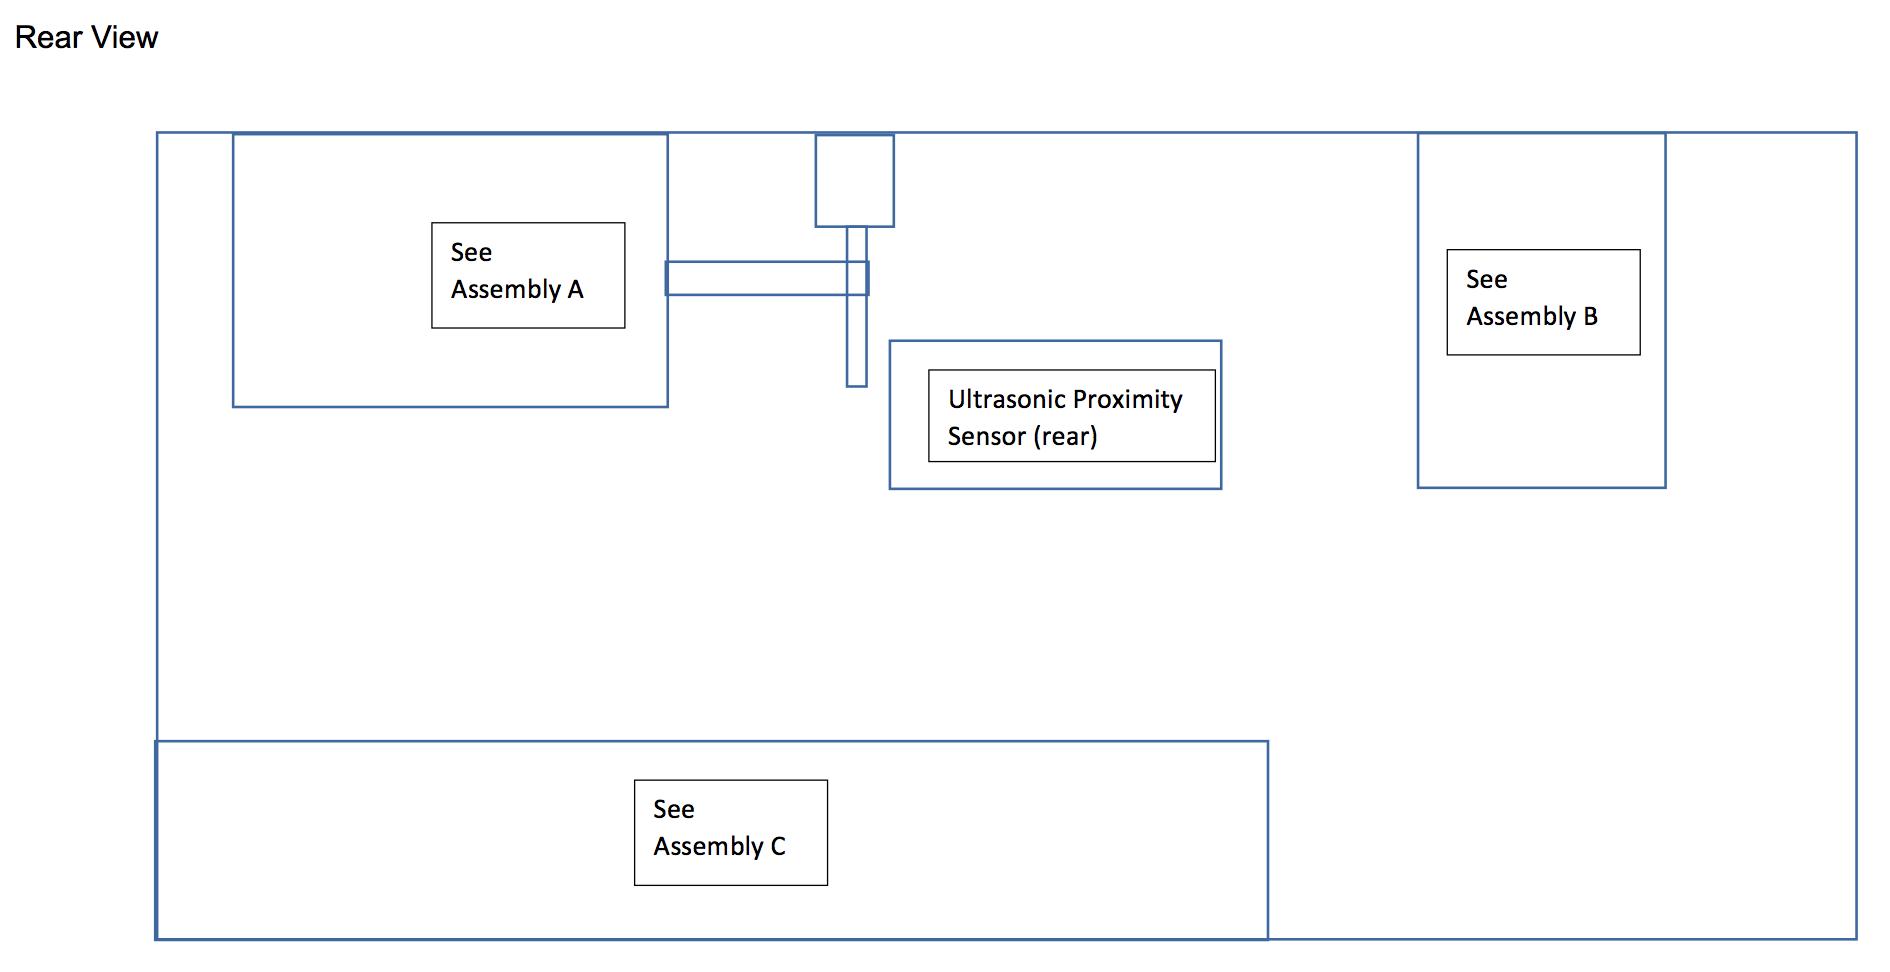 exp1-design3-rjbb-kc-df